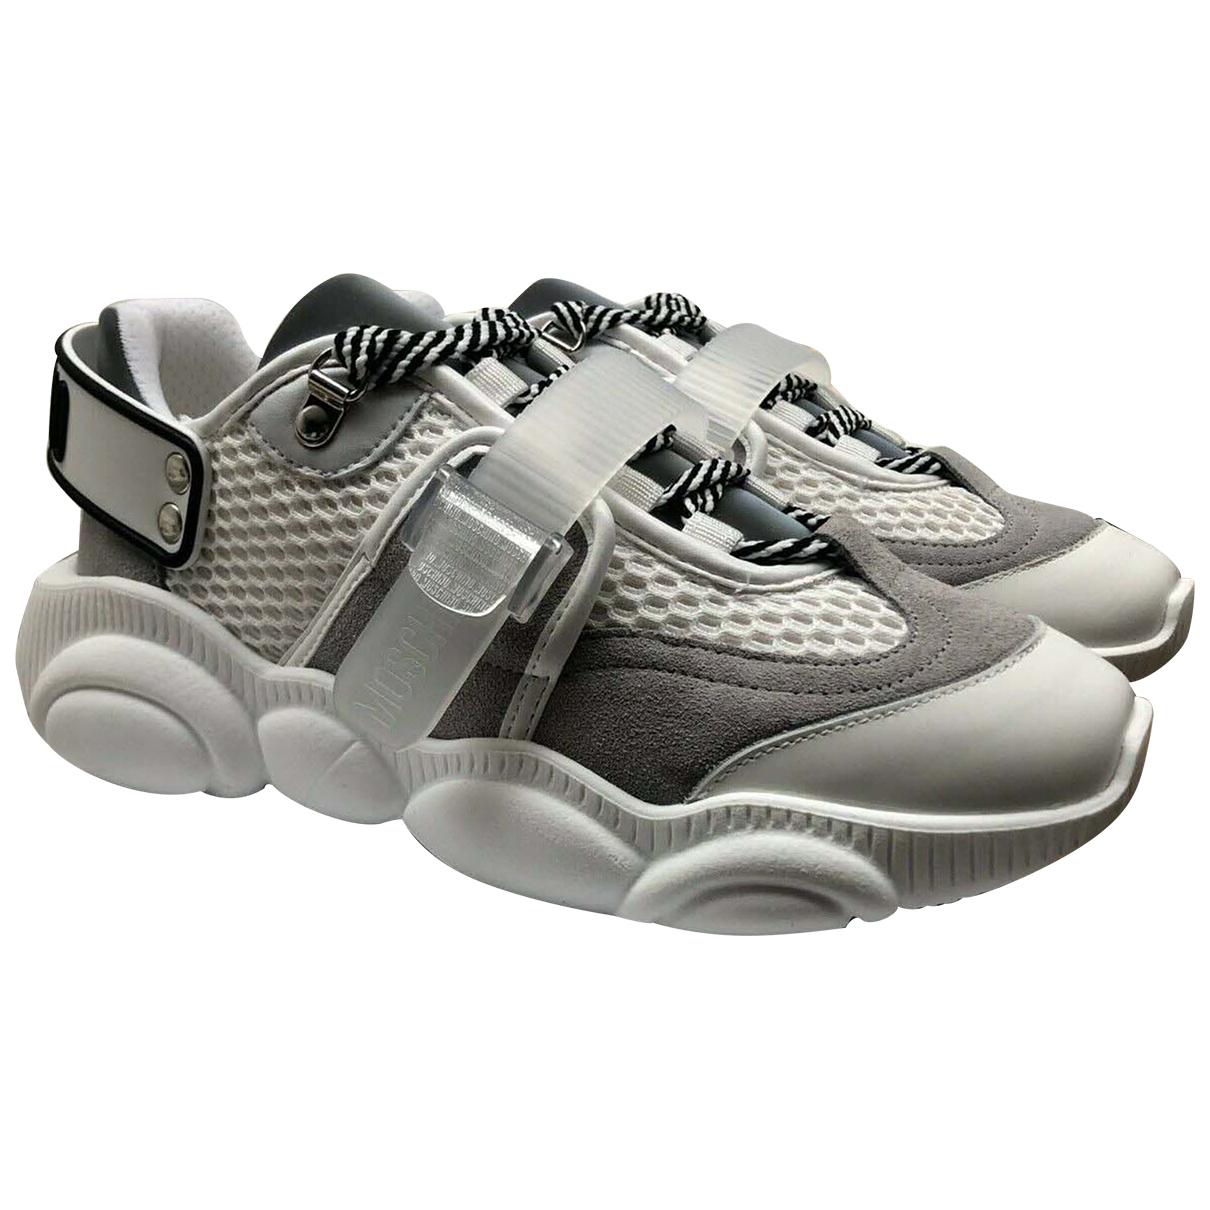 Moschino \N Sneakers in  Weiss Leder